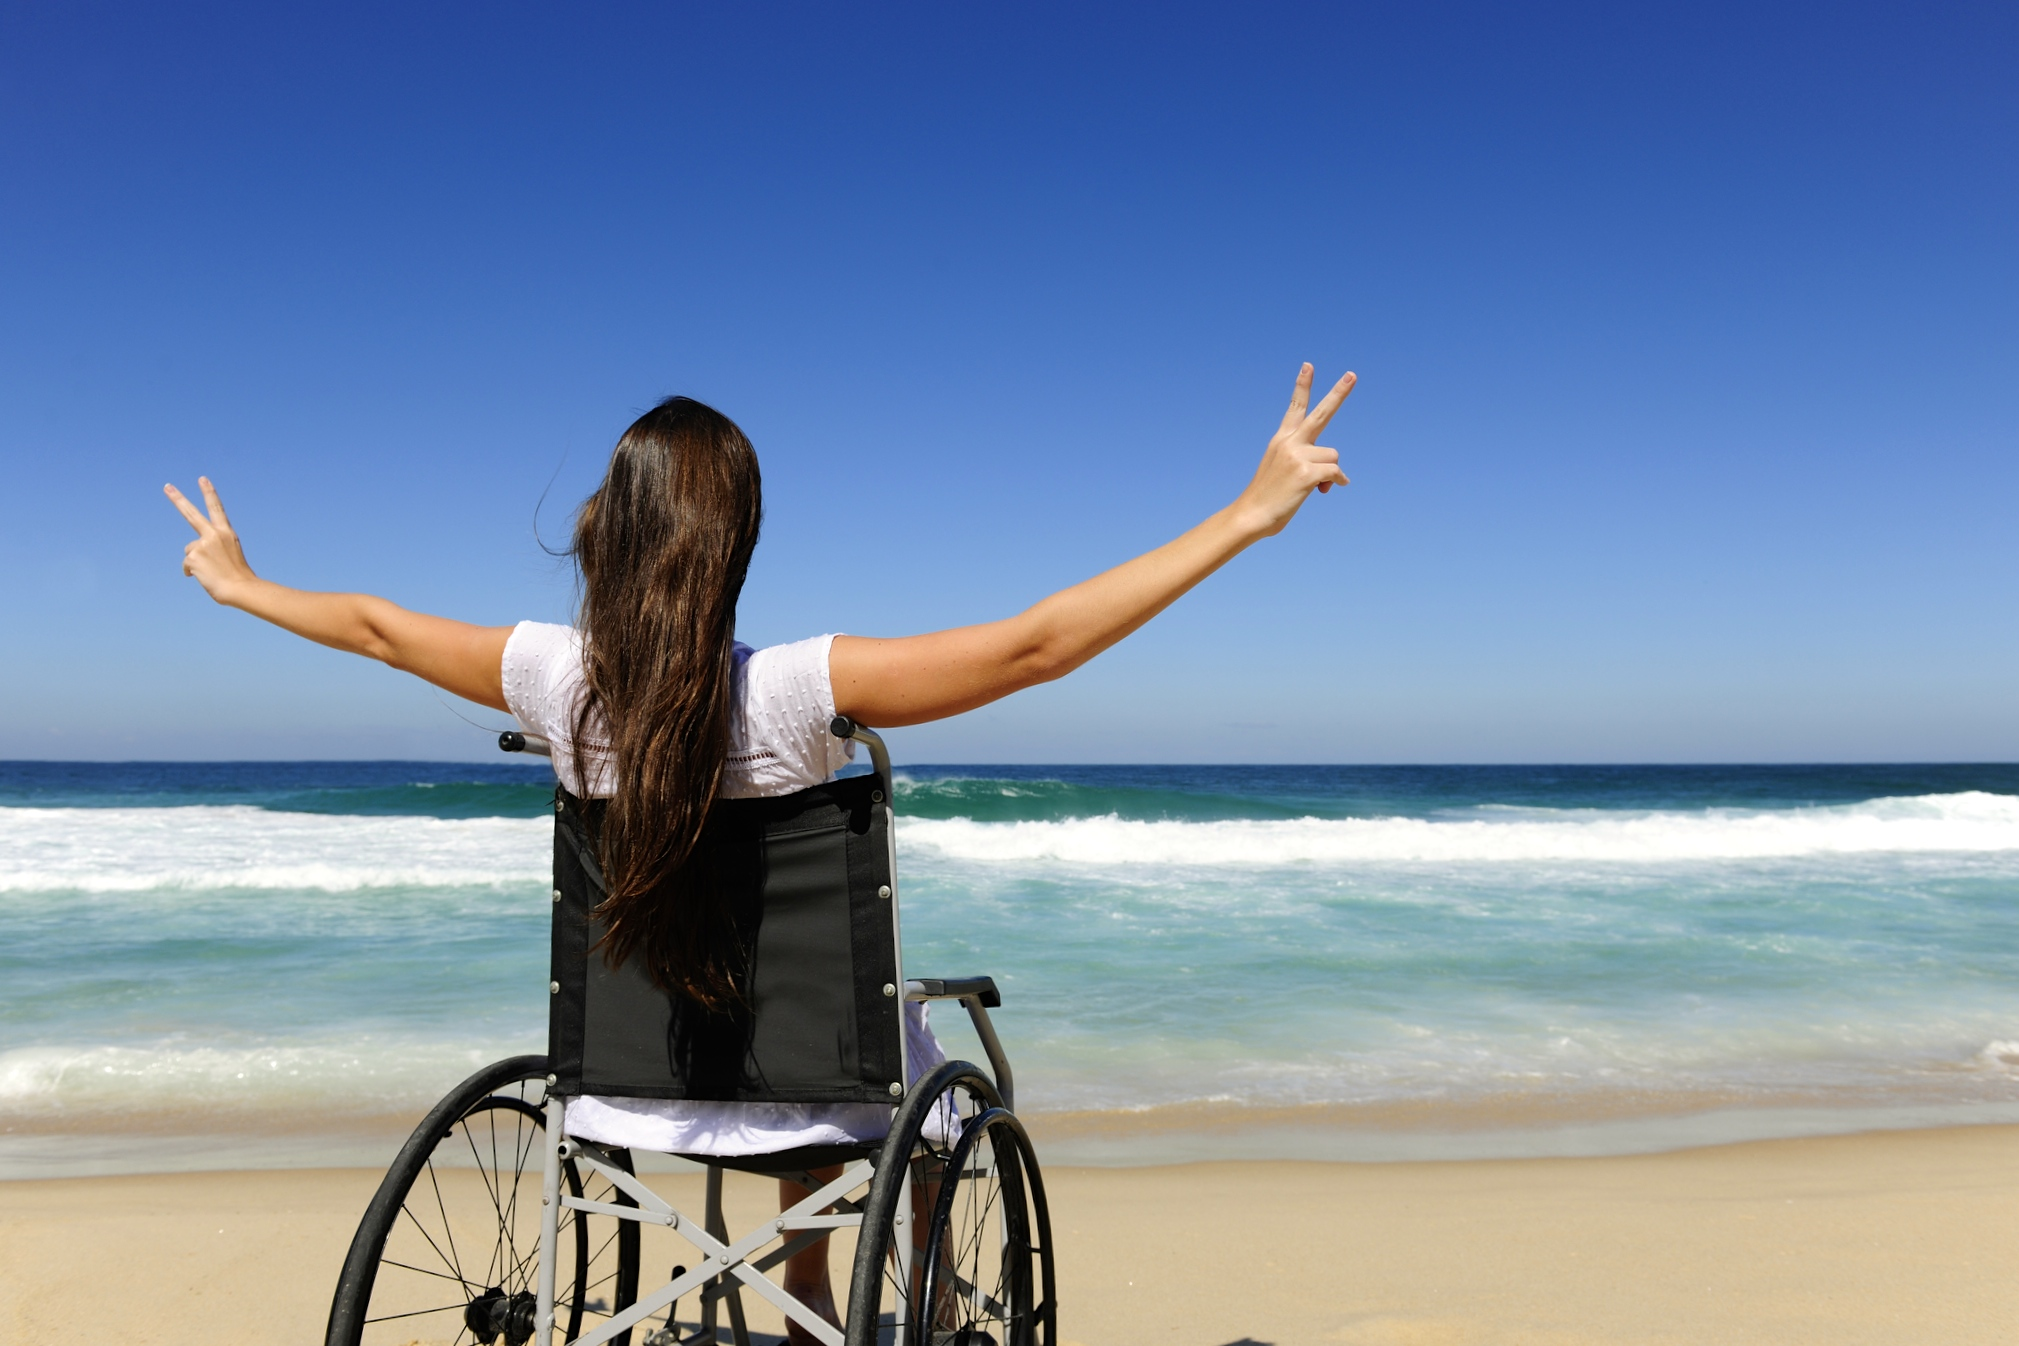 accessible tourism προσβασιμος τουρισμος αμεα